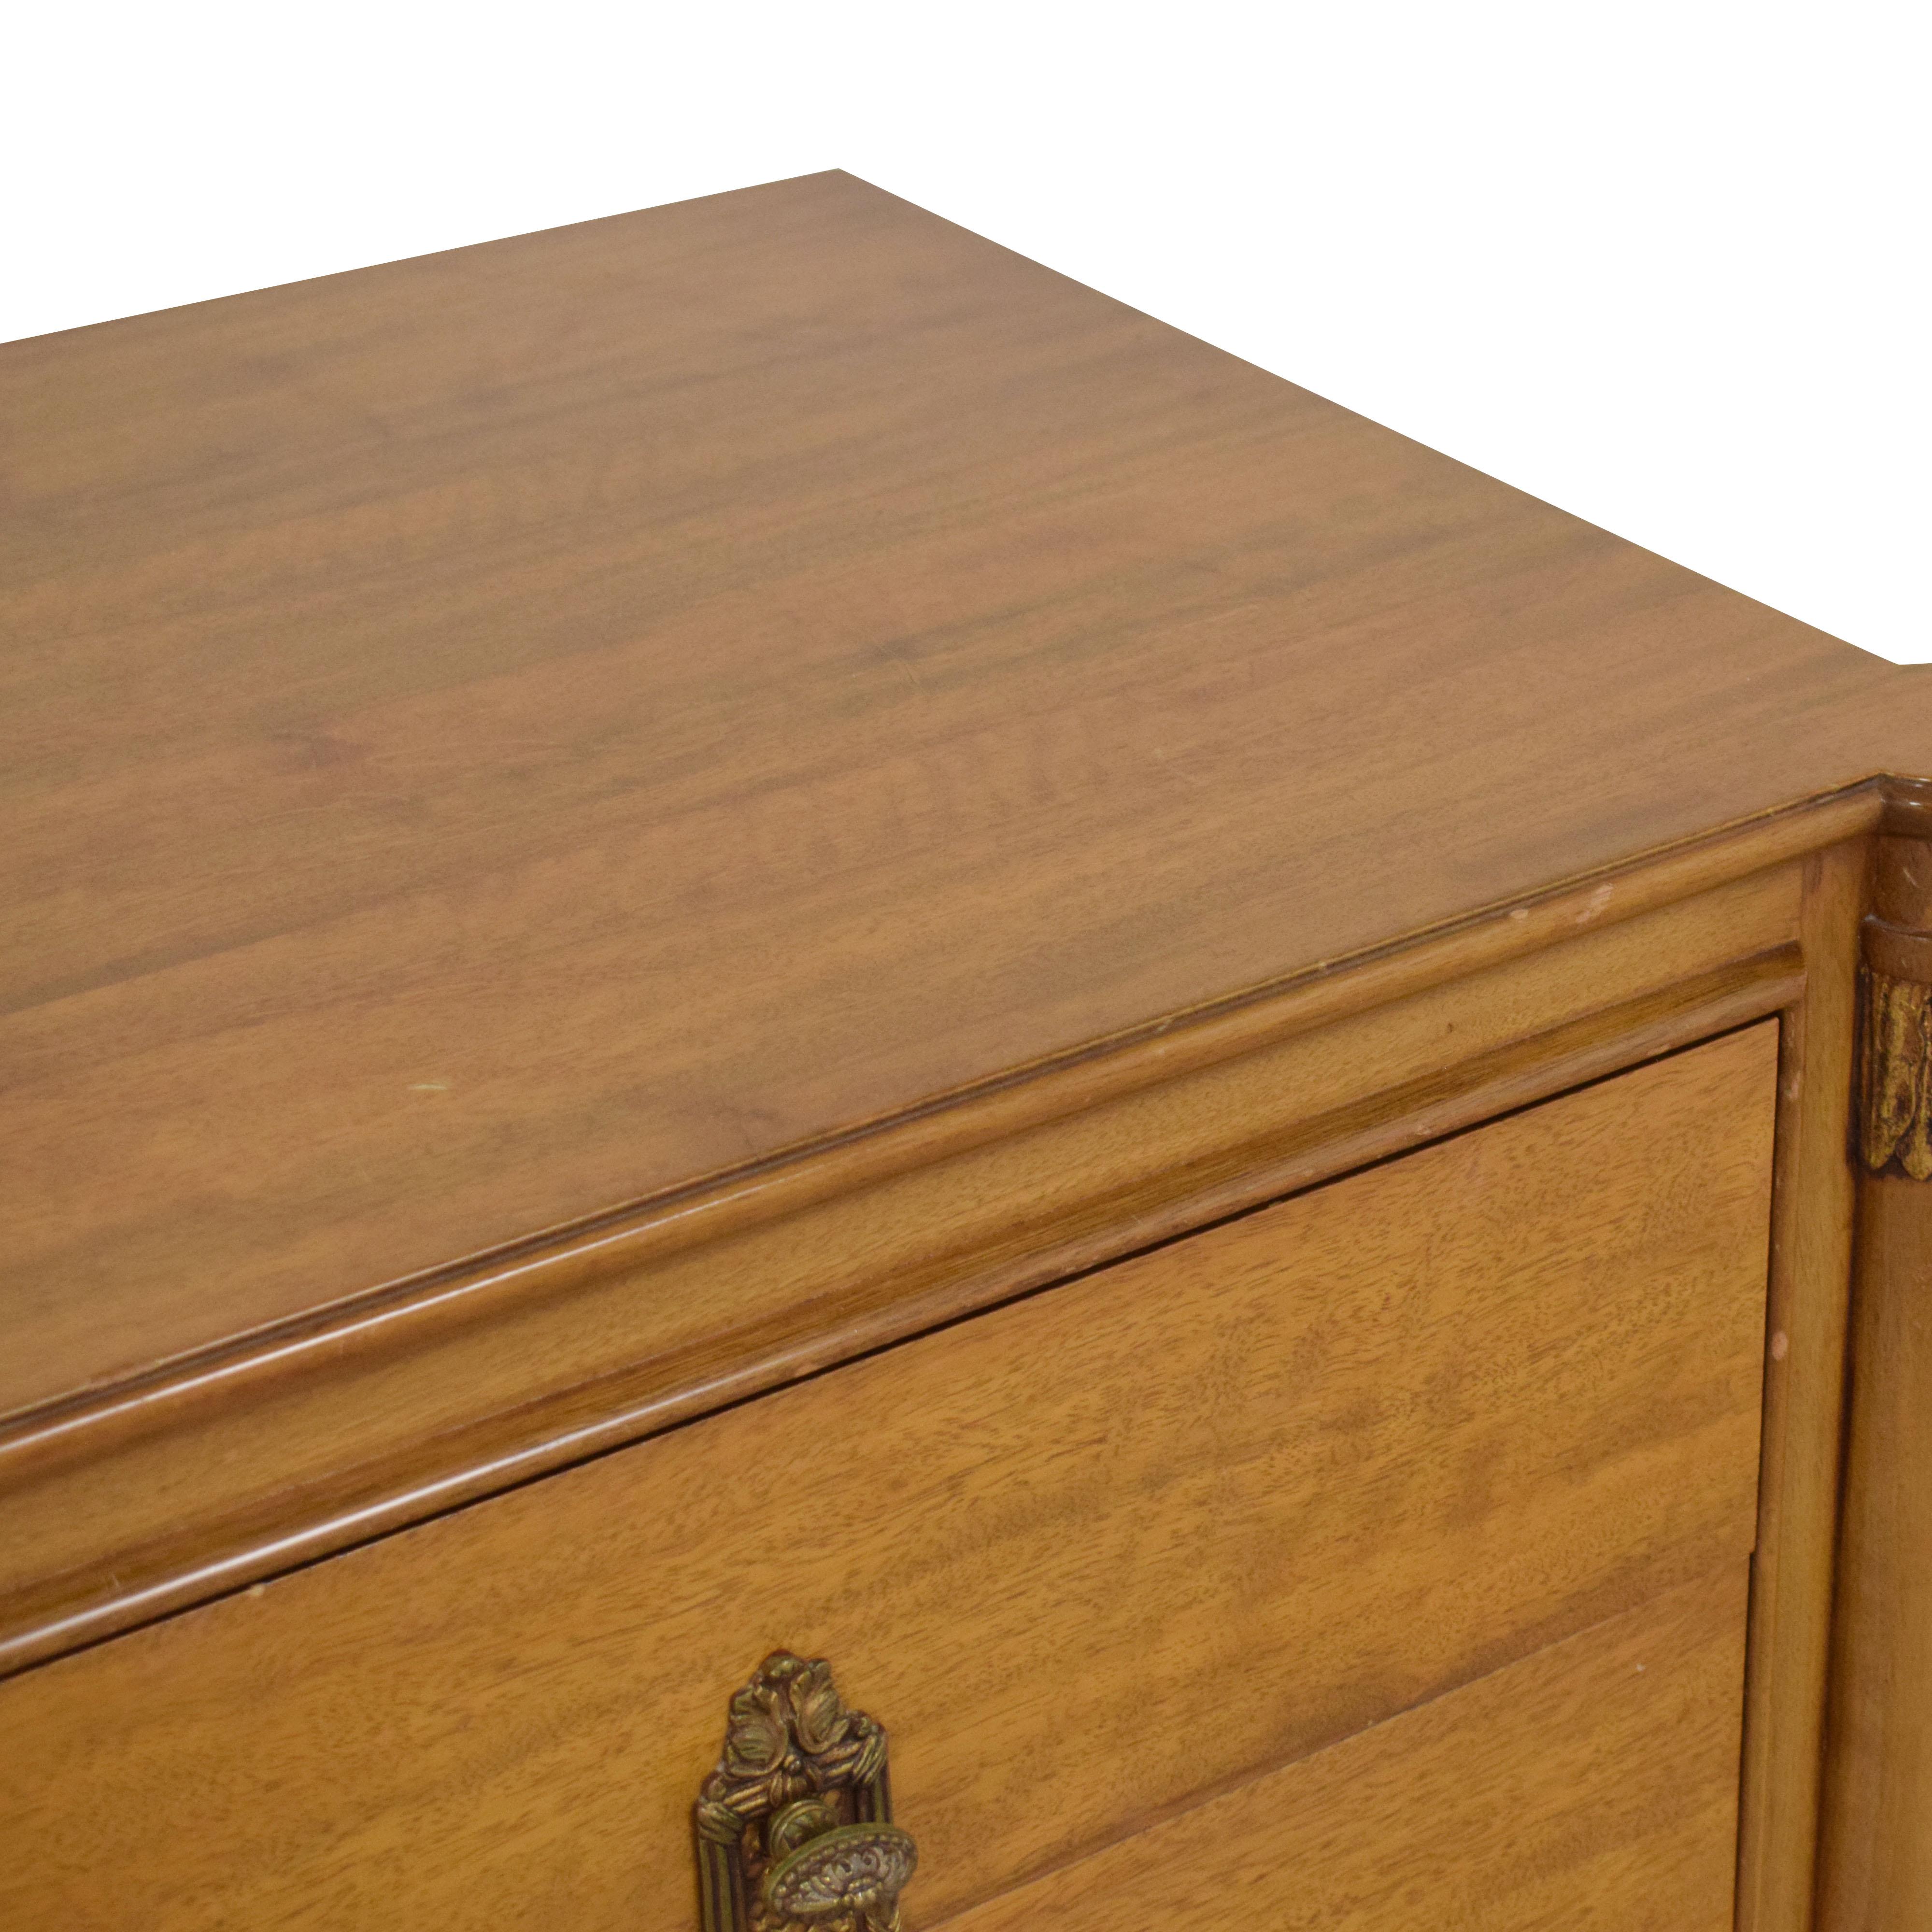 Albano Albano Mid-Century Dresser for sale